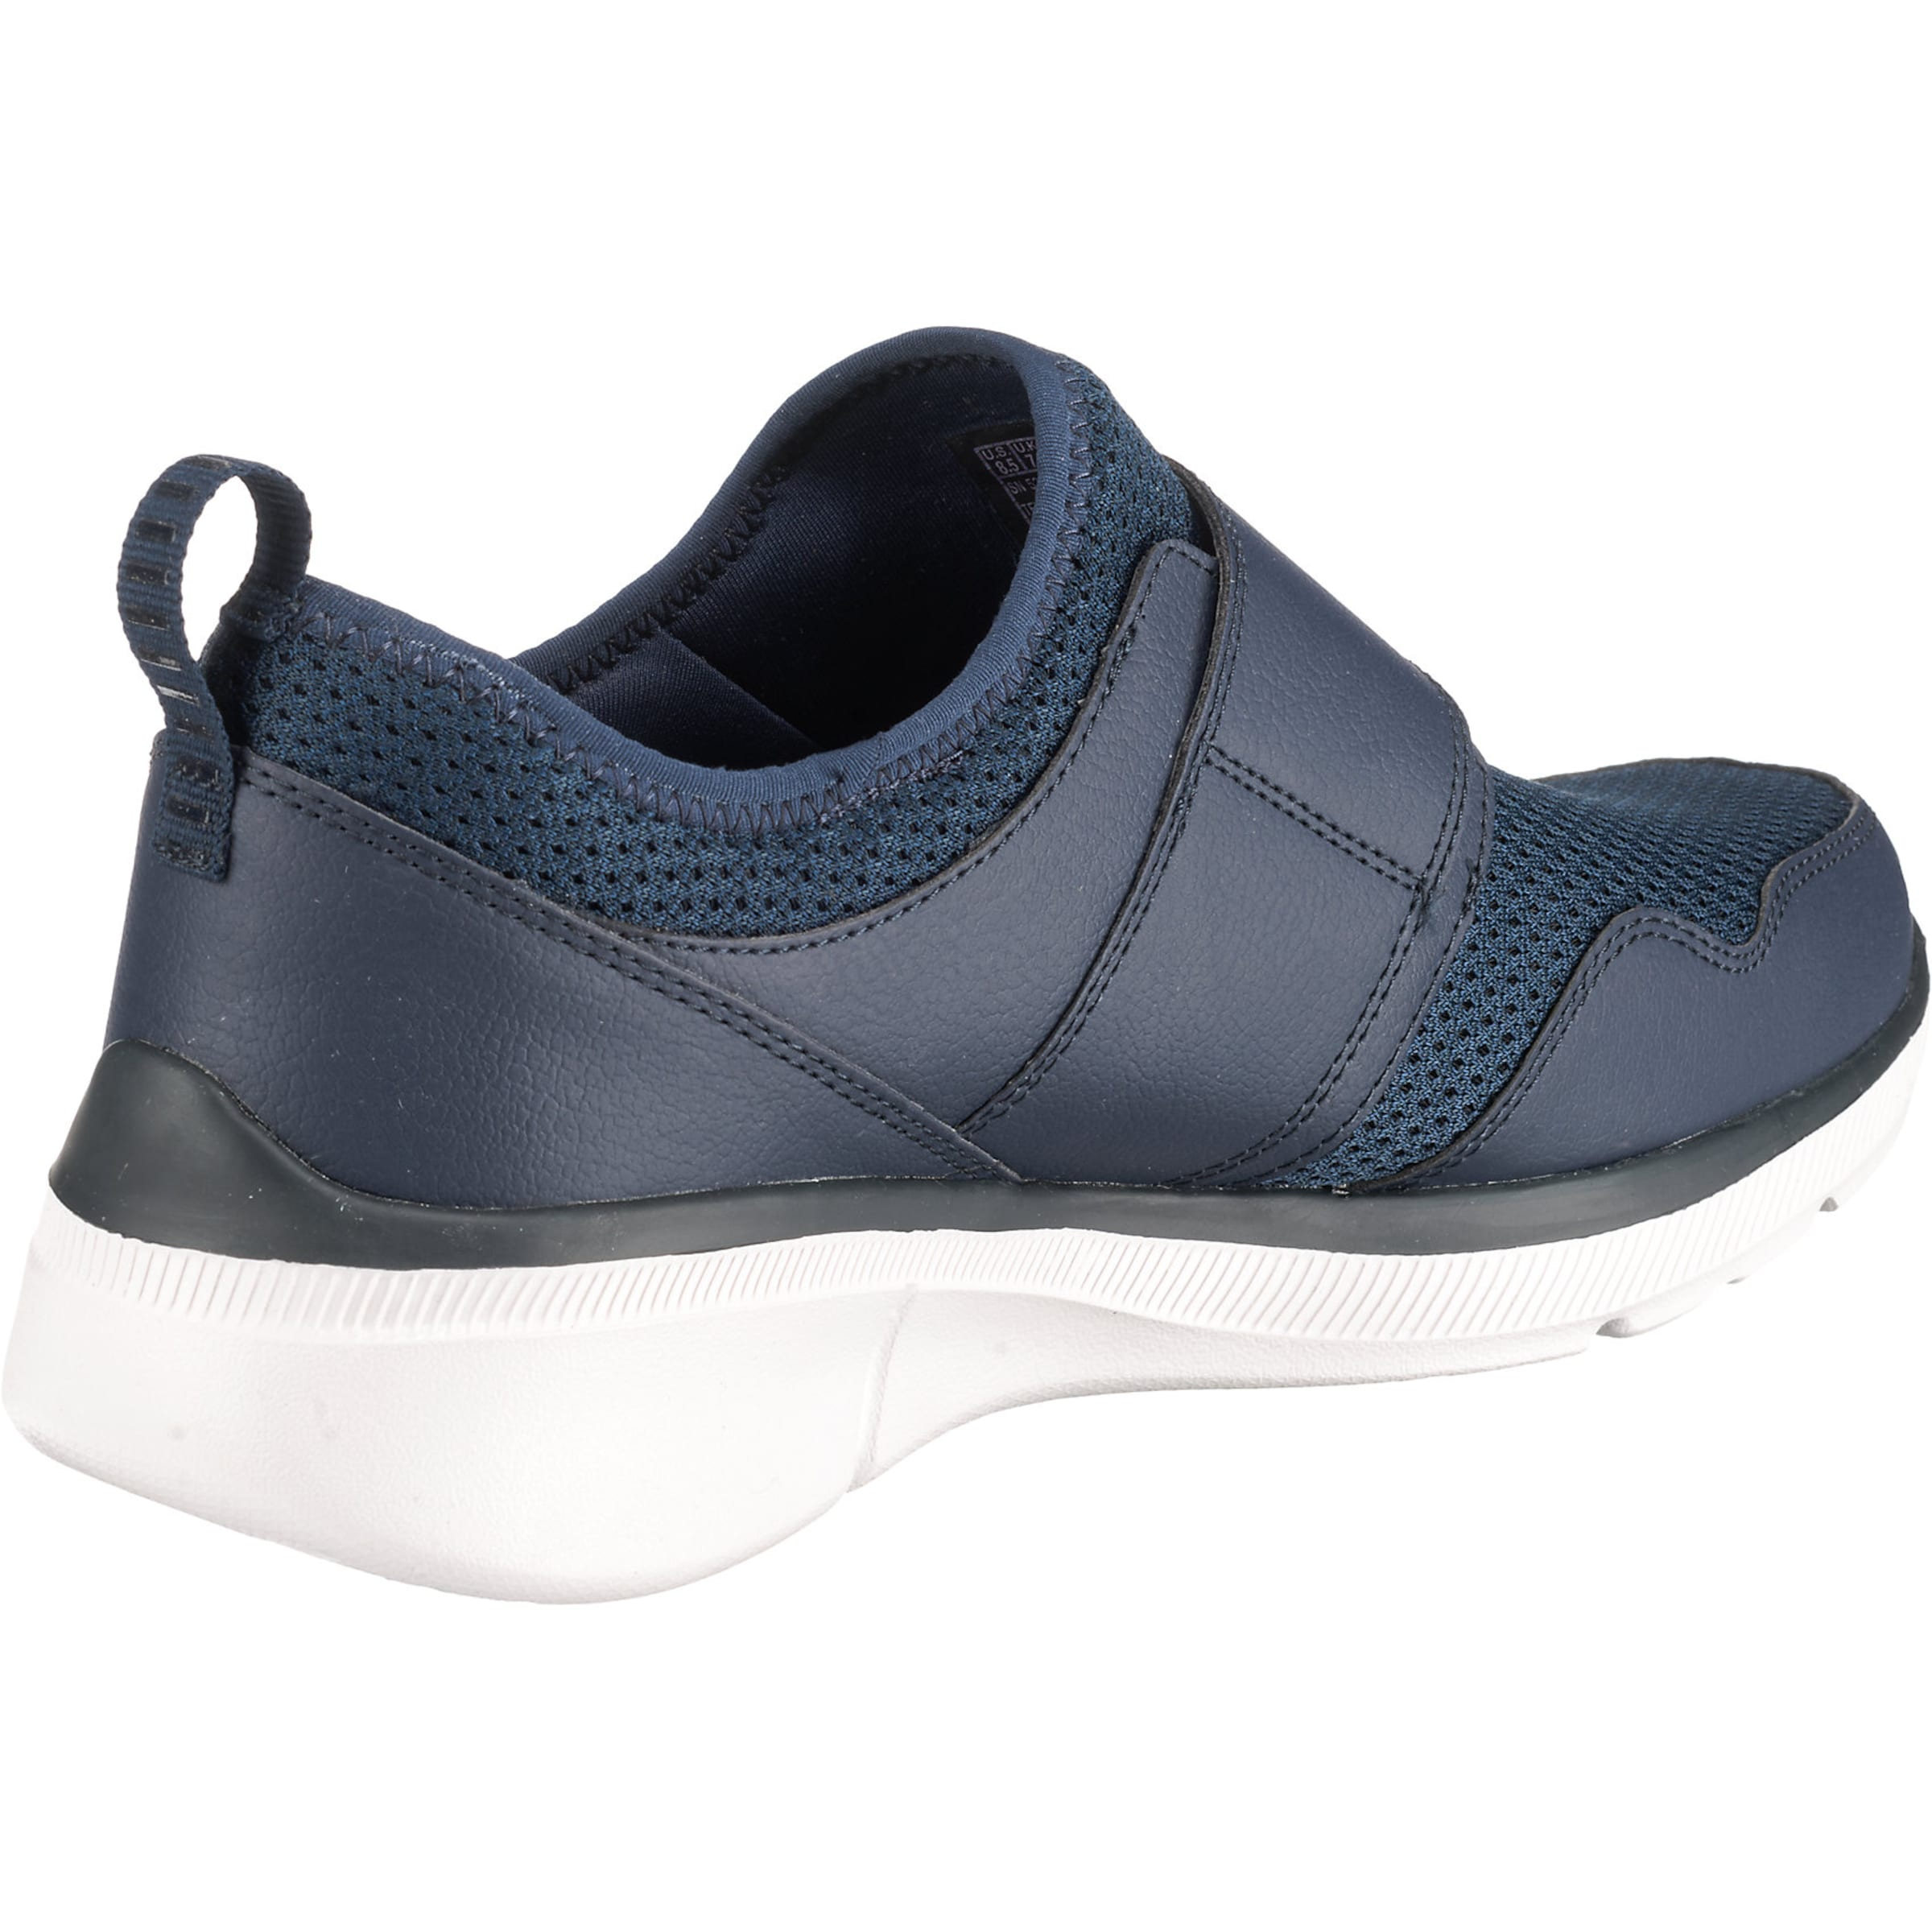 In Bernare' Skechers 'equalizer 3 Sneaker 0 NachtblauWeiß cFJu3l1TK5